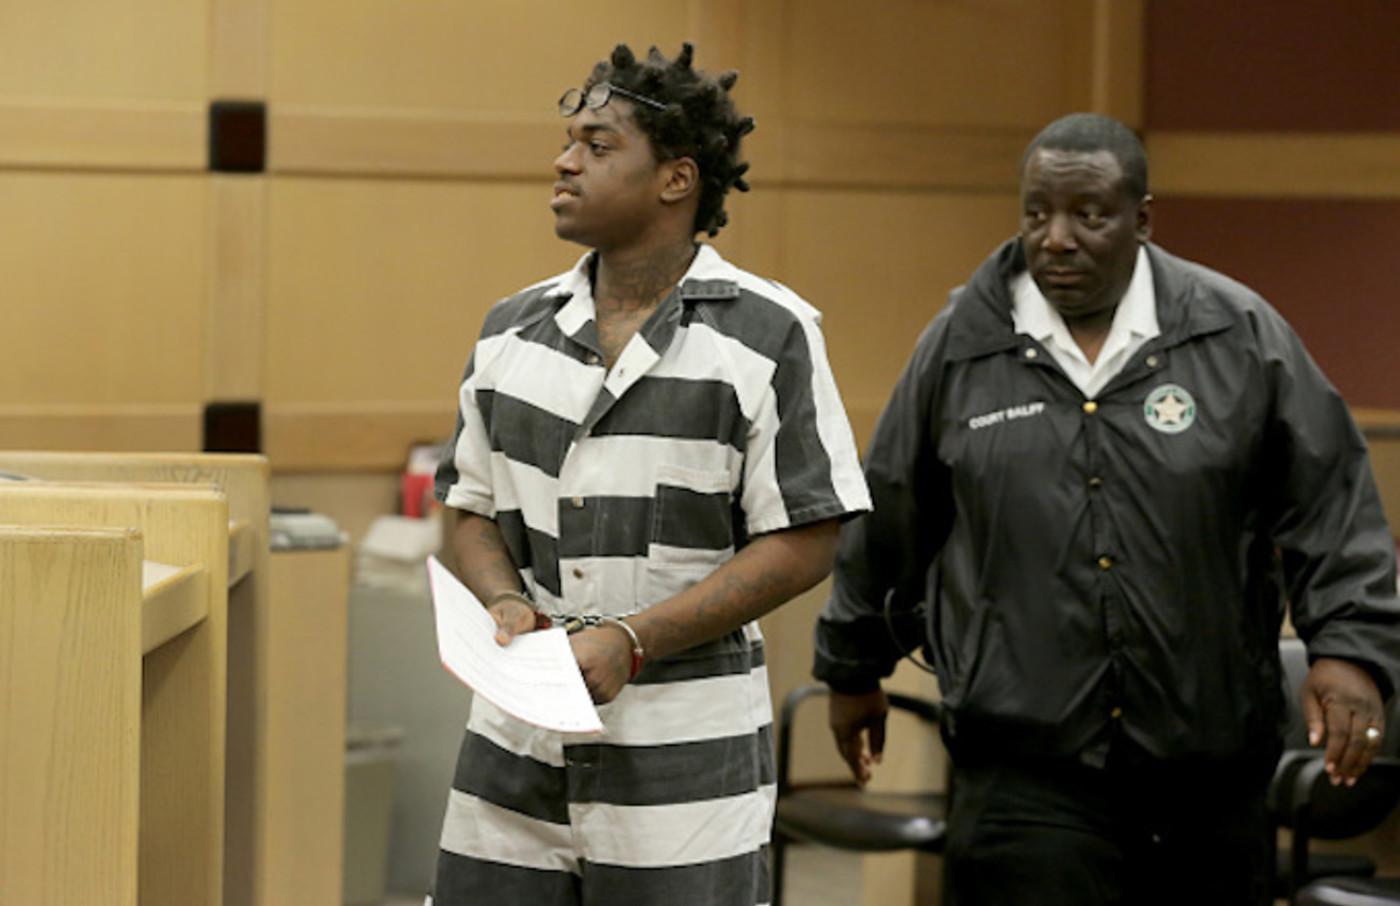 Kodak Black is sentenced to probation by Judge Lisa Porter